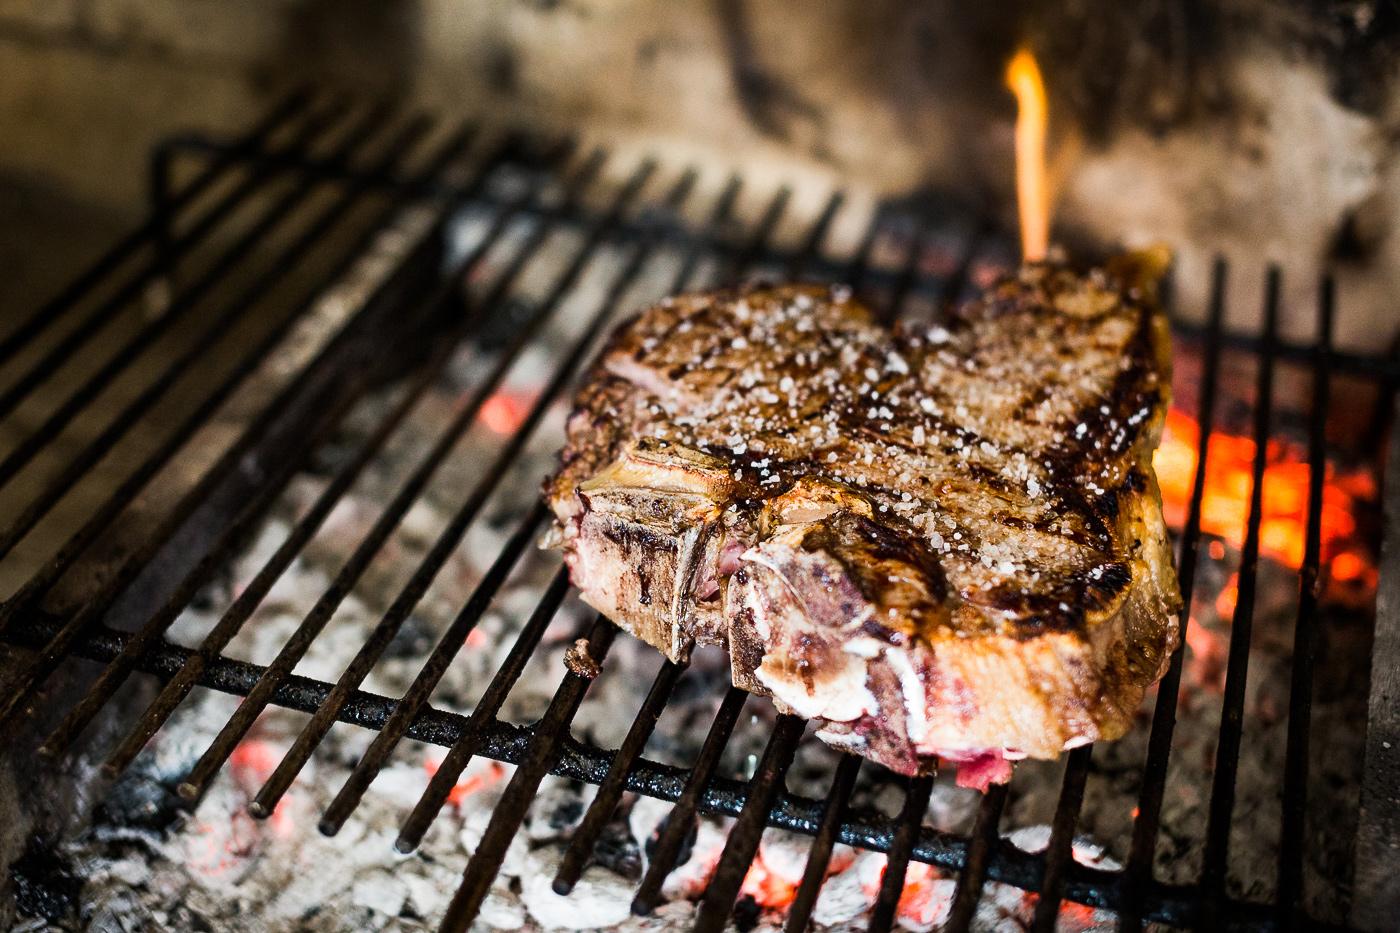 bistecca fiorentina cotta alla brace